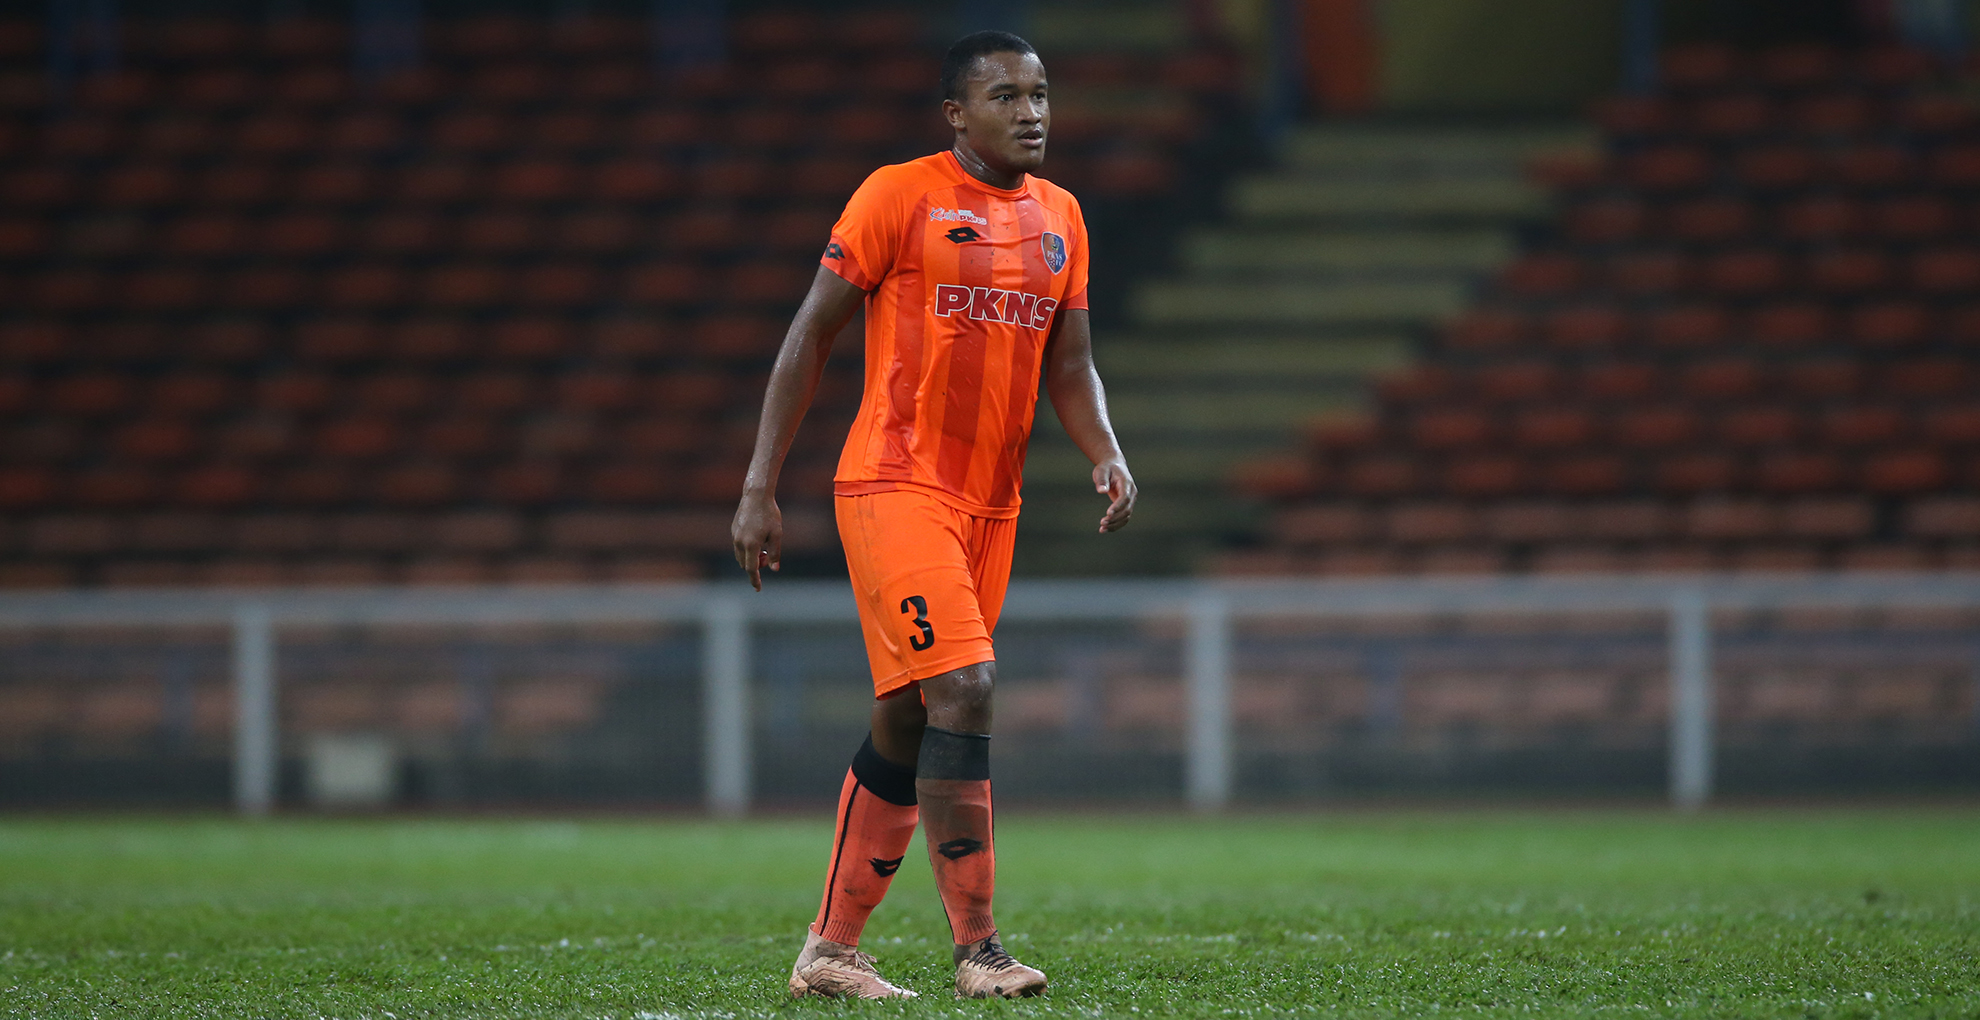 Rodney Akwensivie, PKNS v Melaka, Malaysia FA Cup, 3 Apr 2019